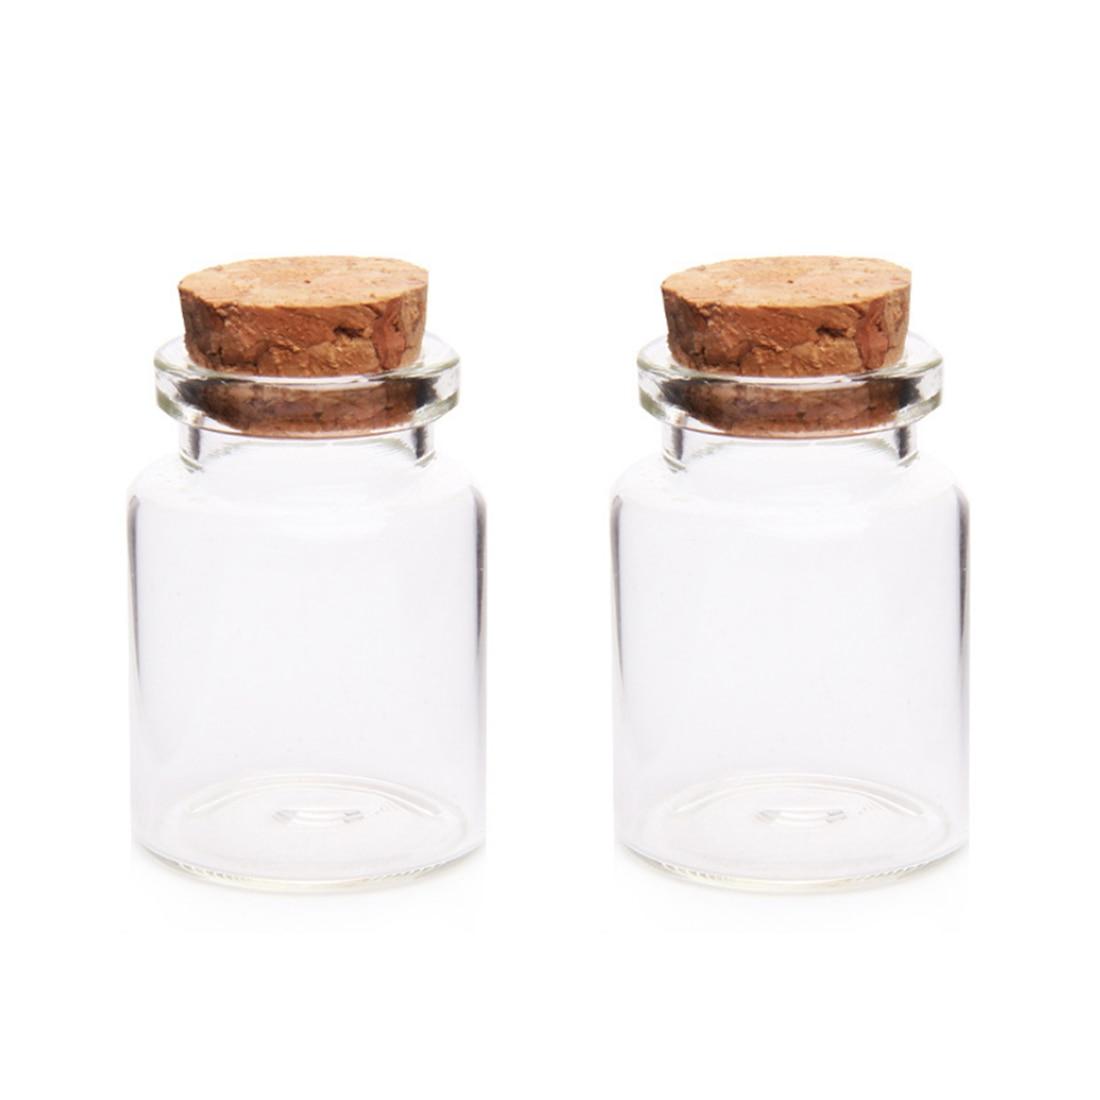 2Pcs 30*40MM 15ML Glass Bottles Wishing Bottle Empty Sample Storage Jars with Cork Stoppers - Transparent glass bottle